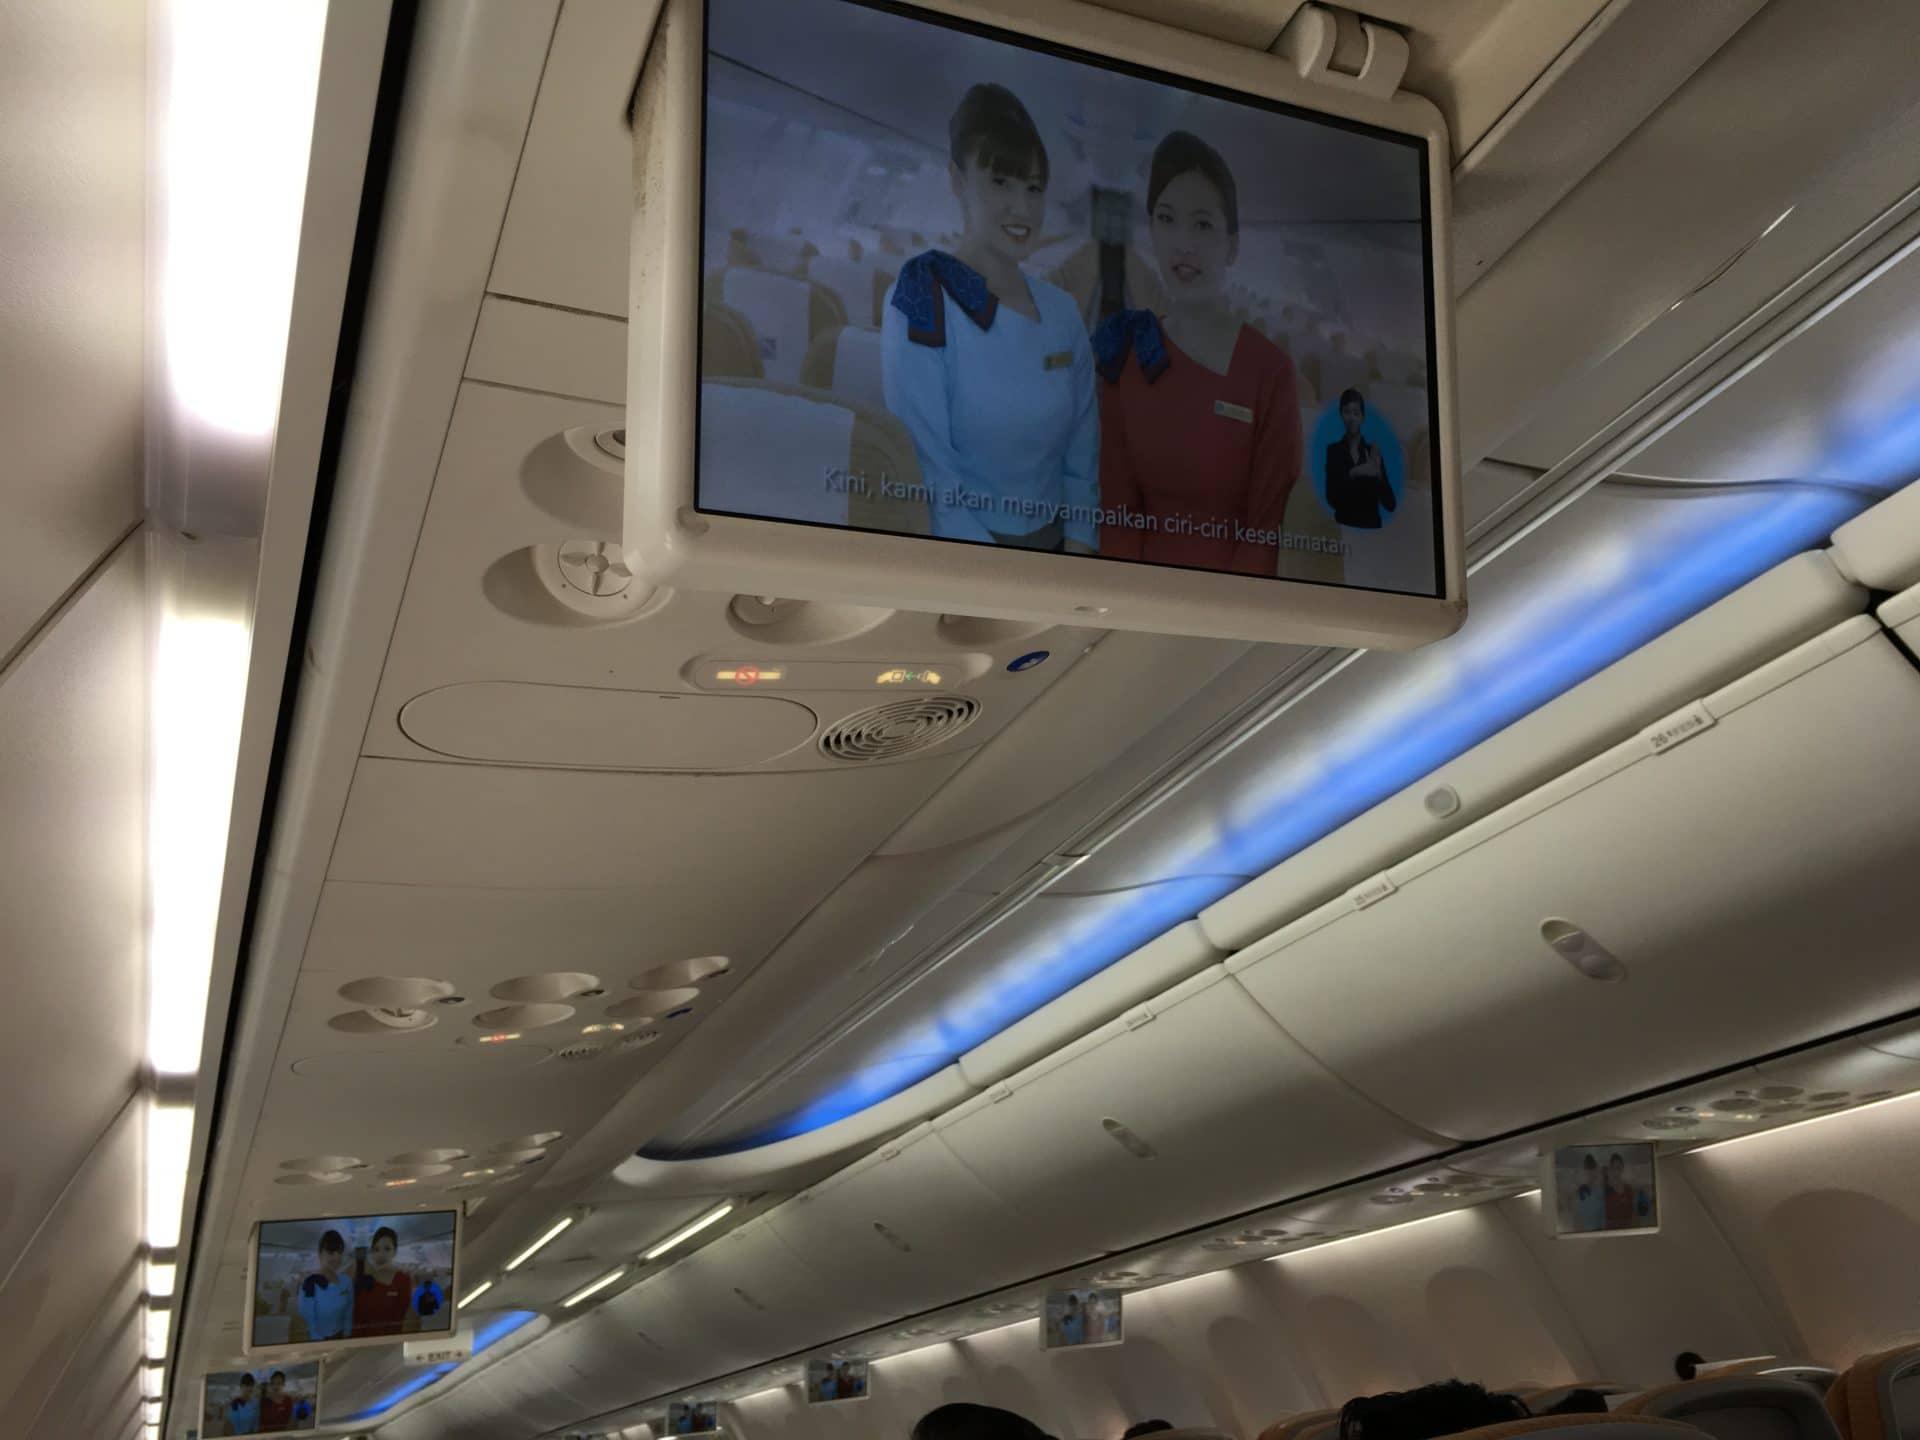 Silk Air Economy Class Kurzstrecke Bildschirm